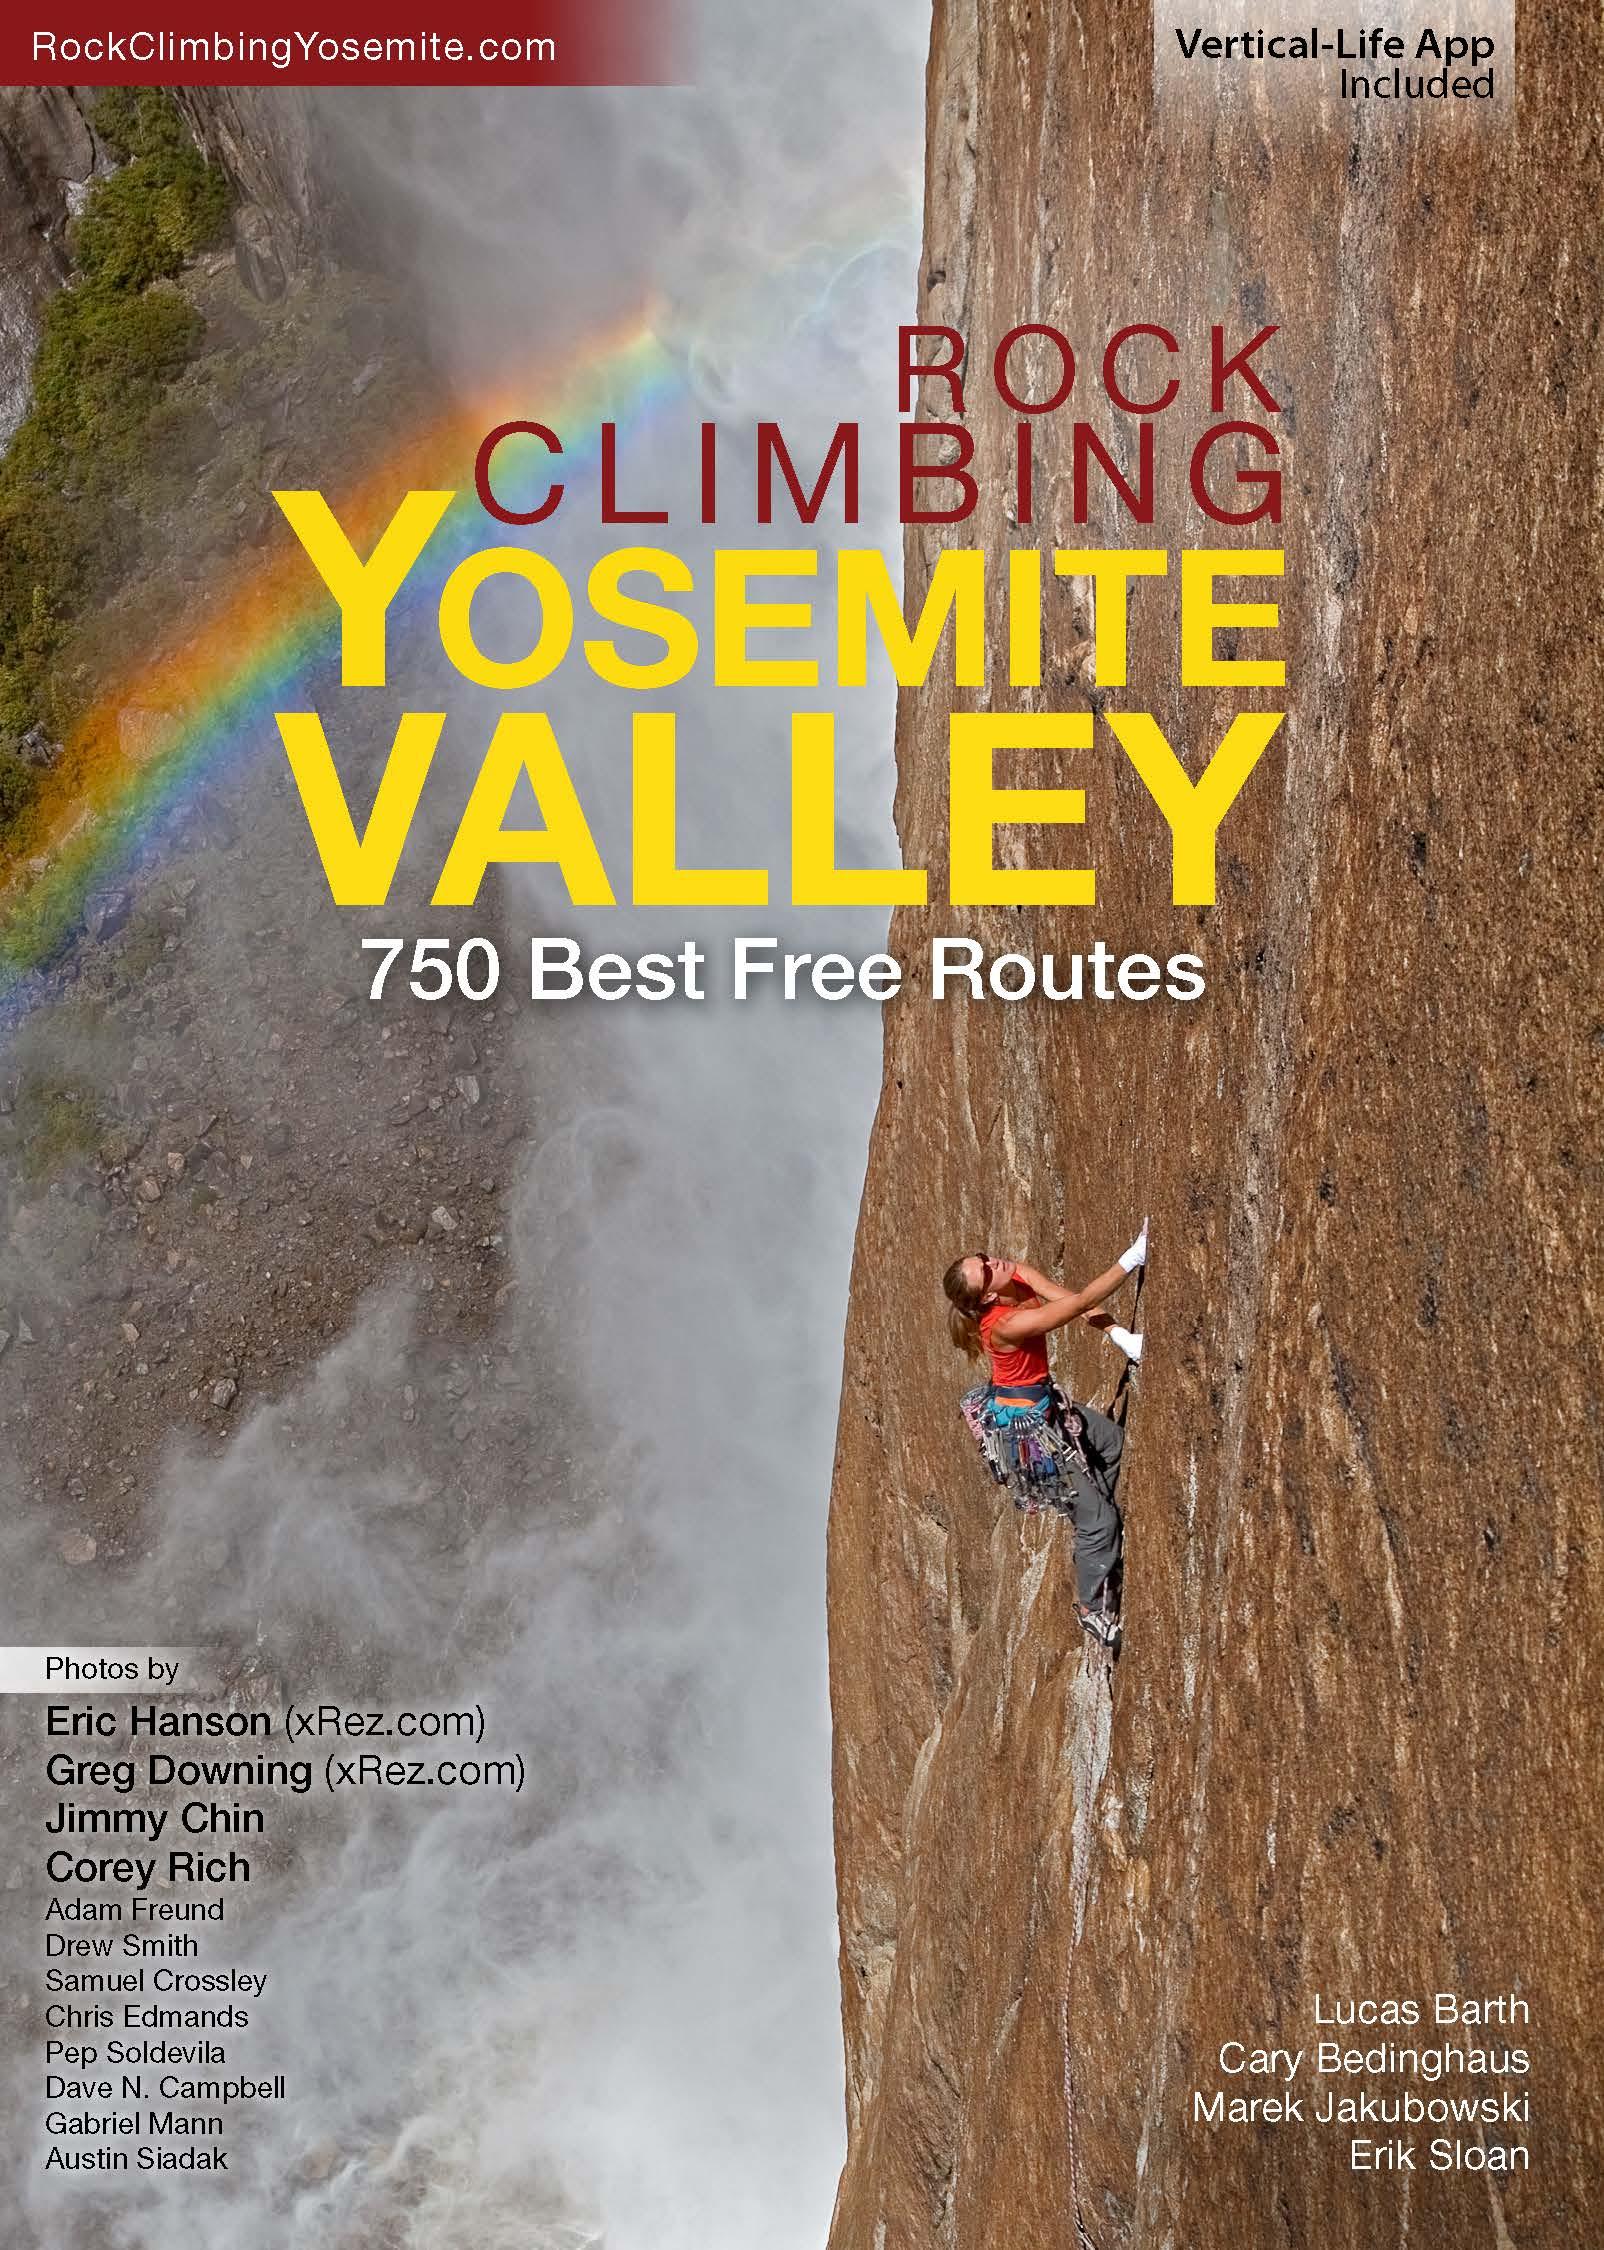 Rock Climbing Yosemite Valley Guide Book